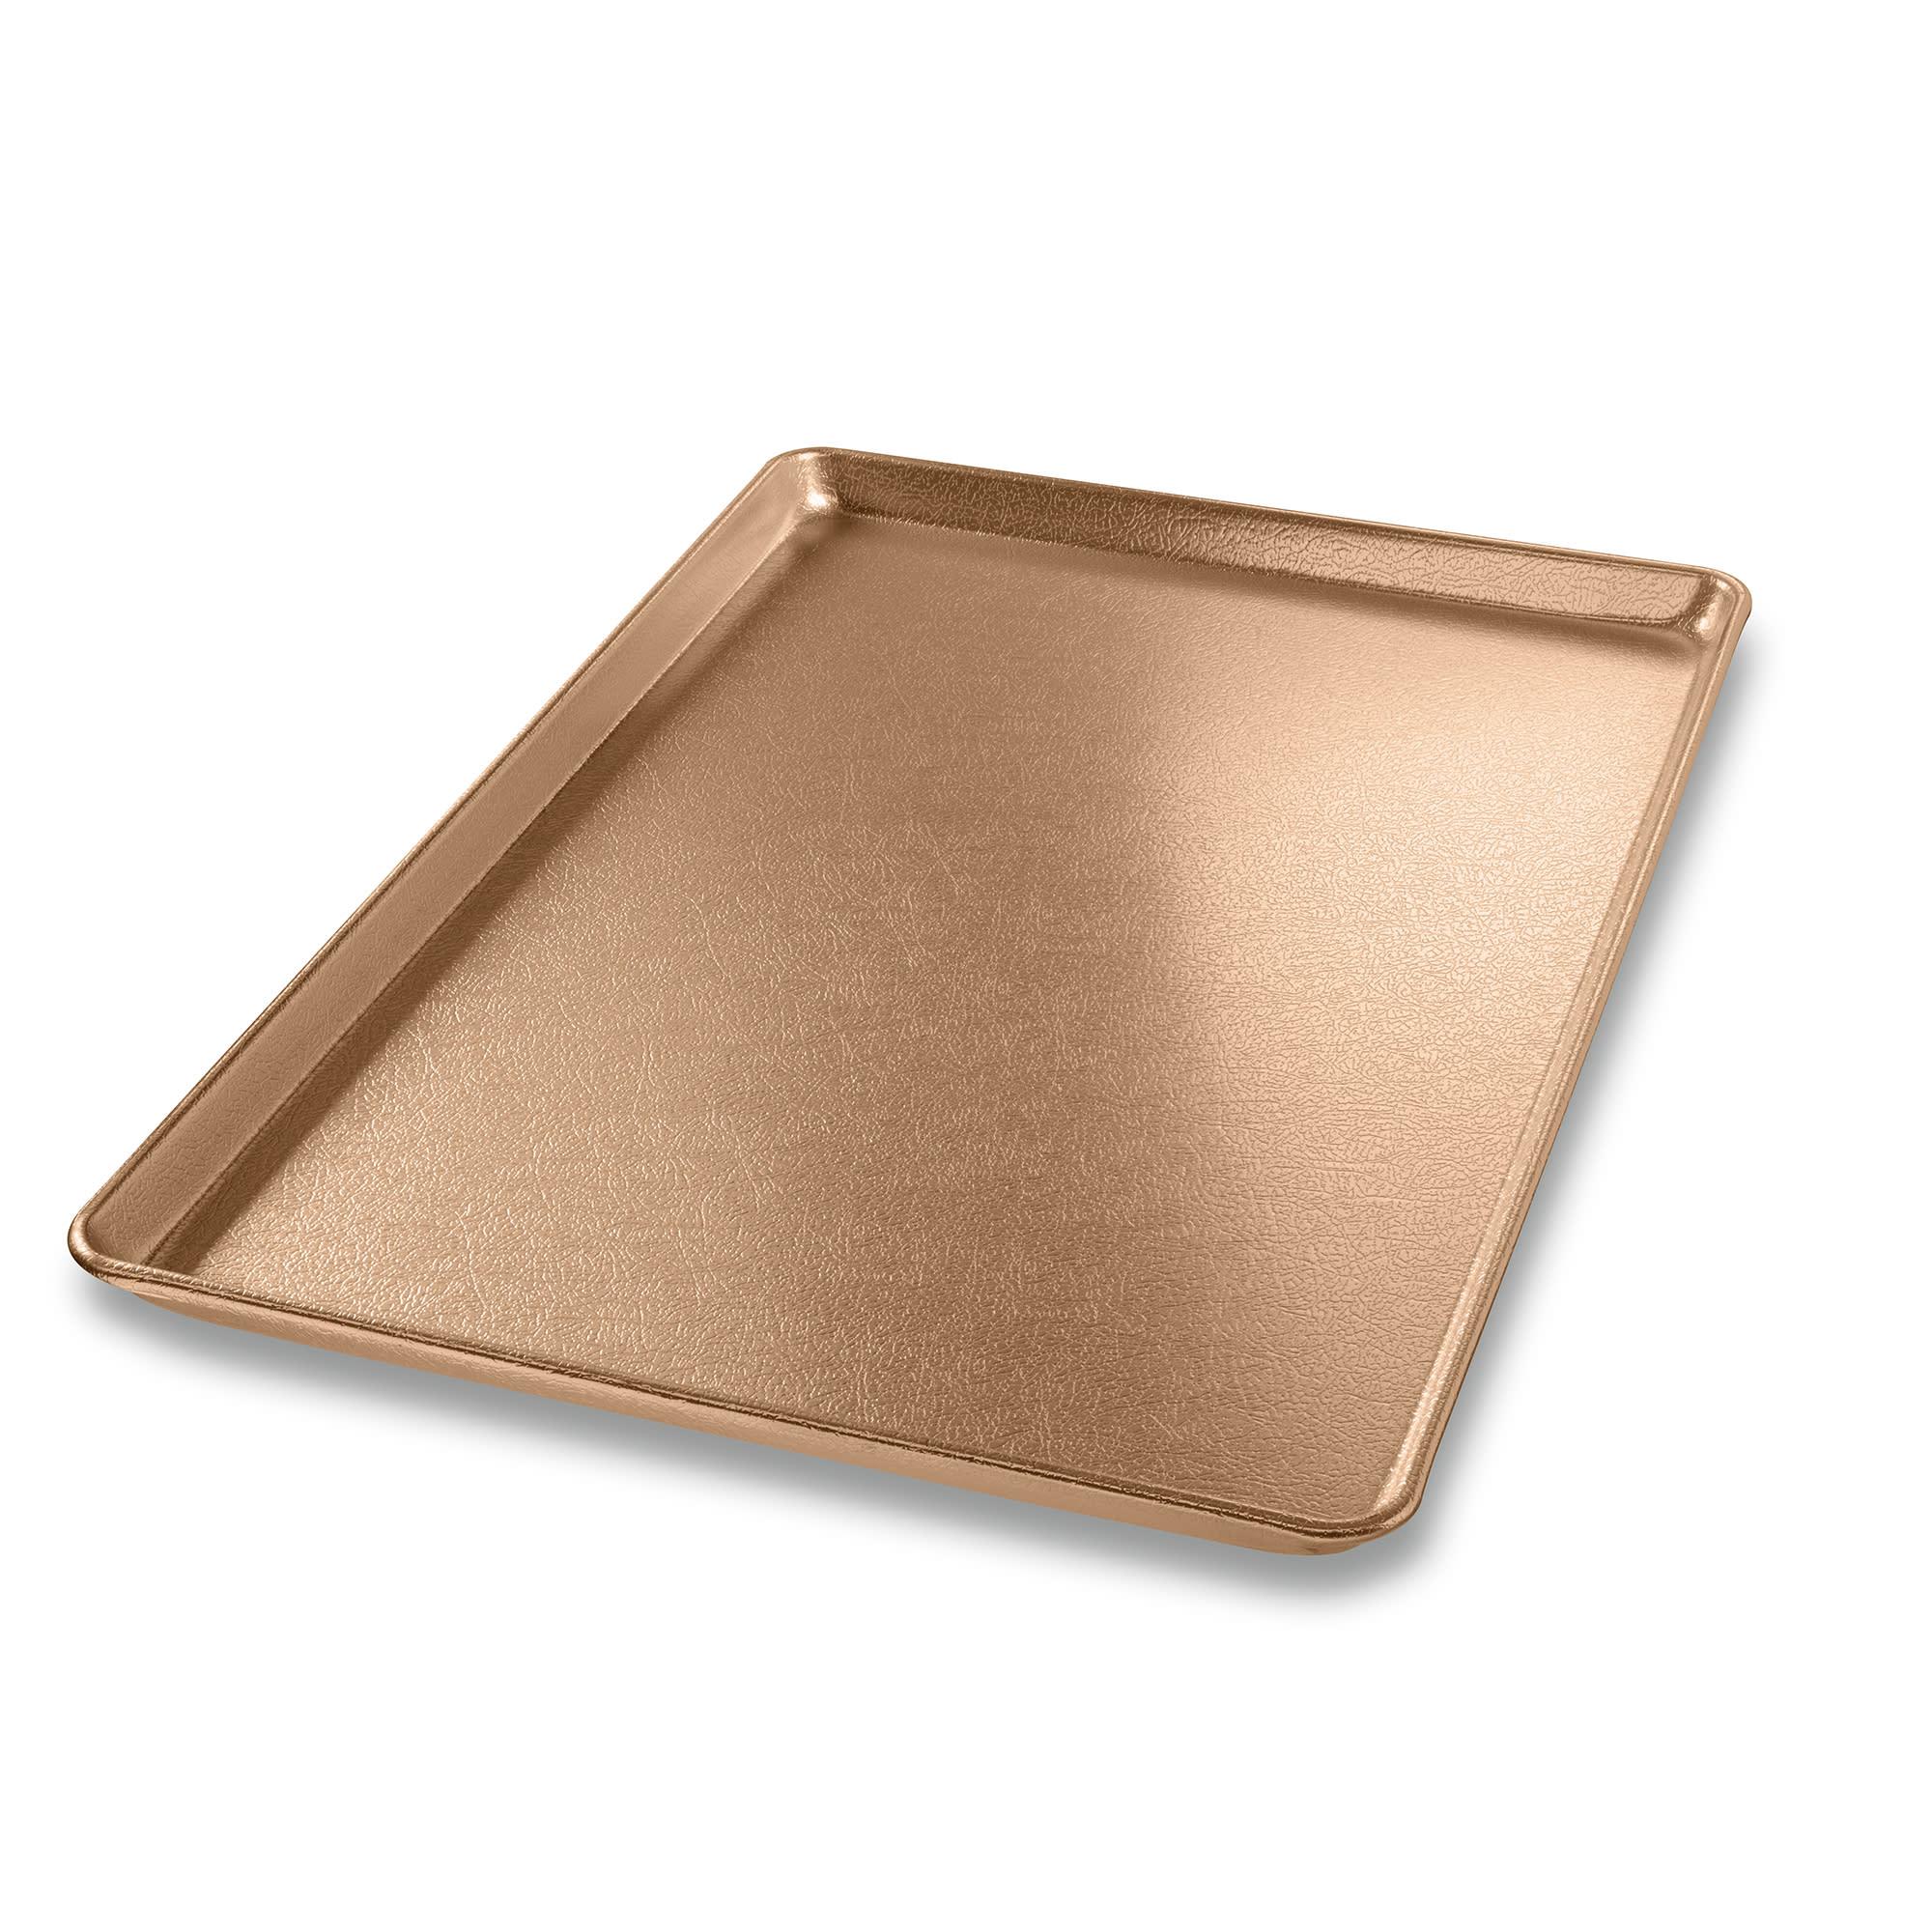 Chicago Metallic 40910 Full-Size Display Pan, Gold Finish, Anodized Aluminum